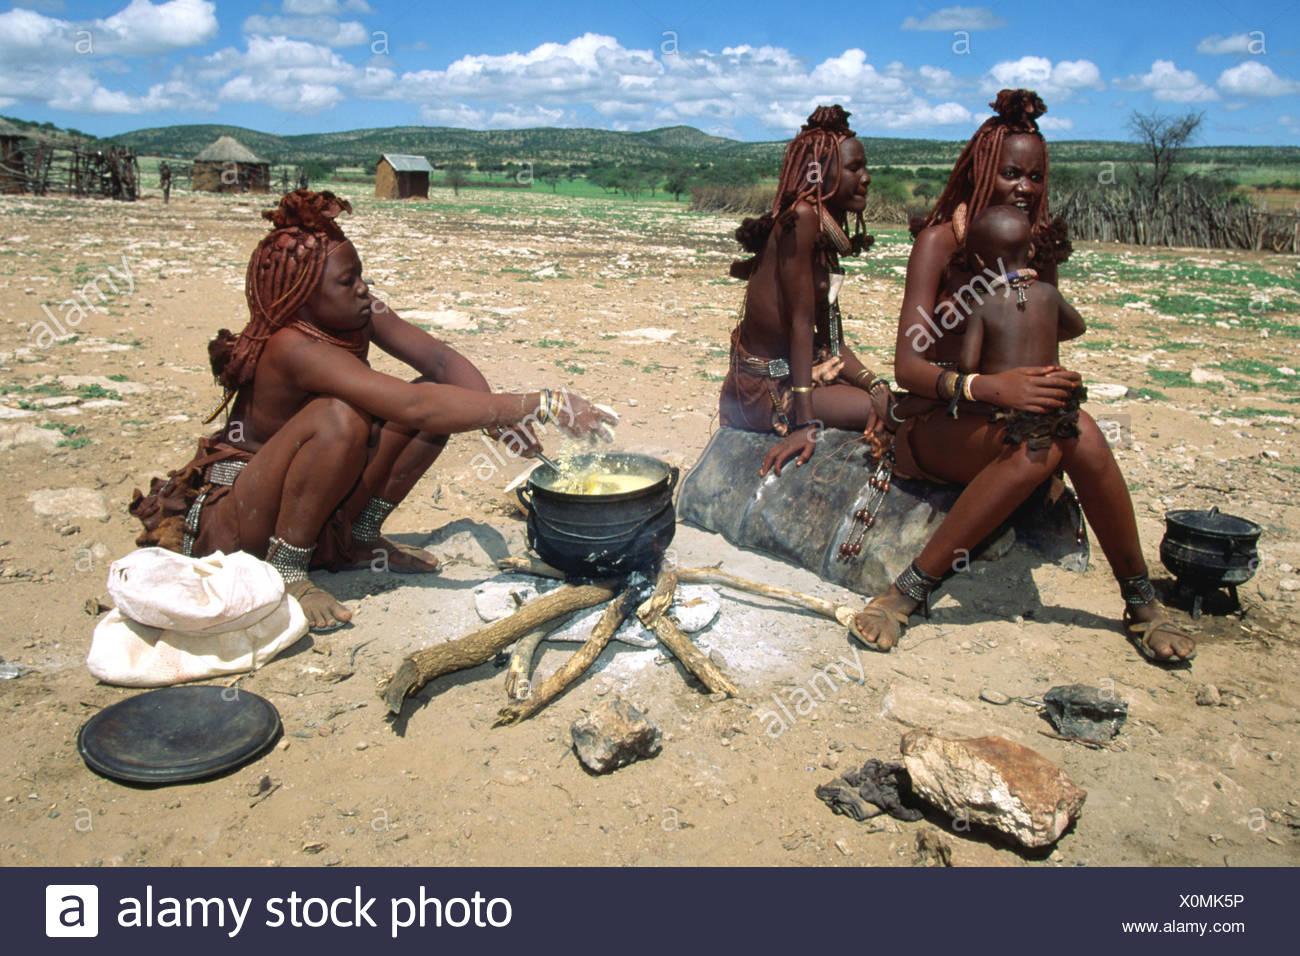 himba women, Namibia - Stock Image